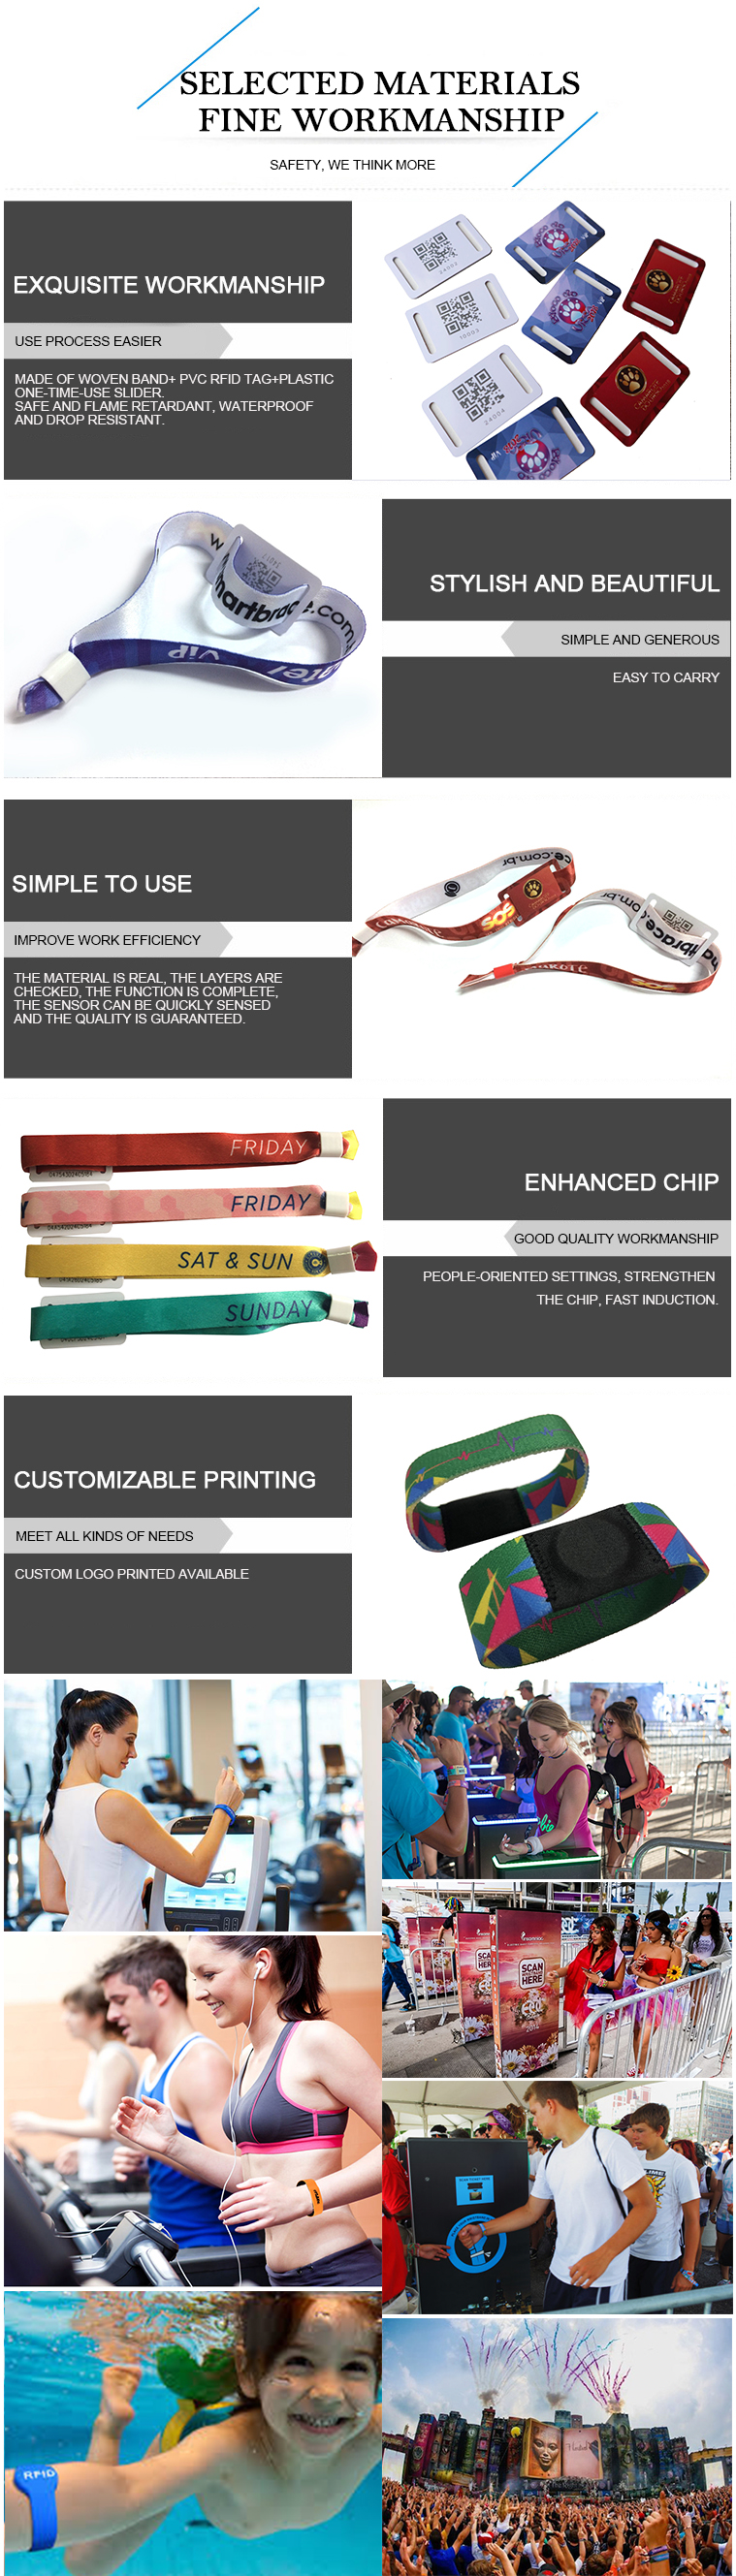 Nylon fabric rfid woven qr code wristbands/bracelet for amusement park